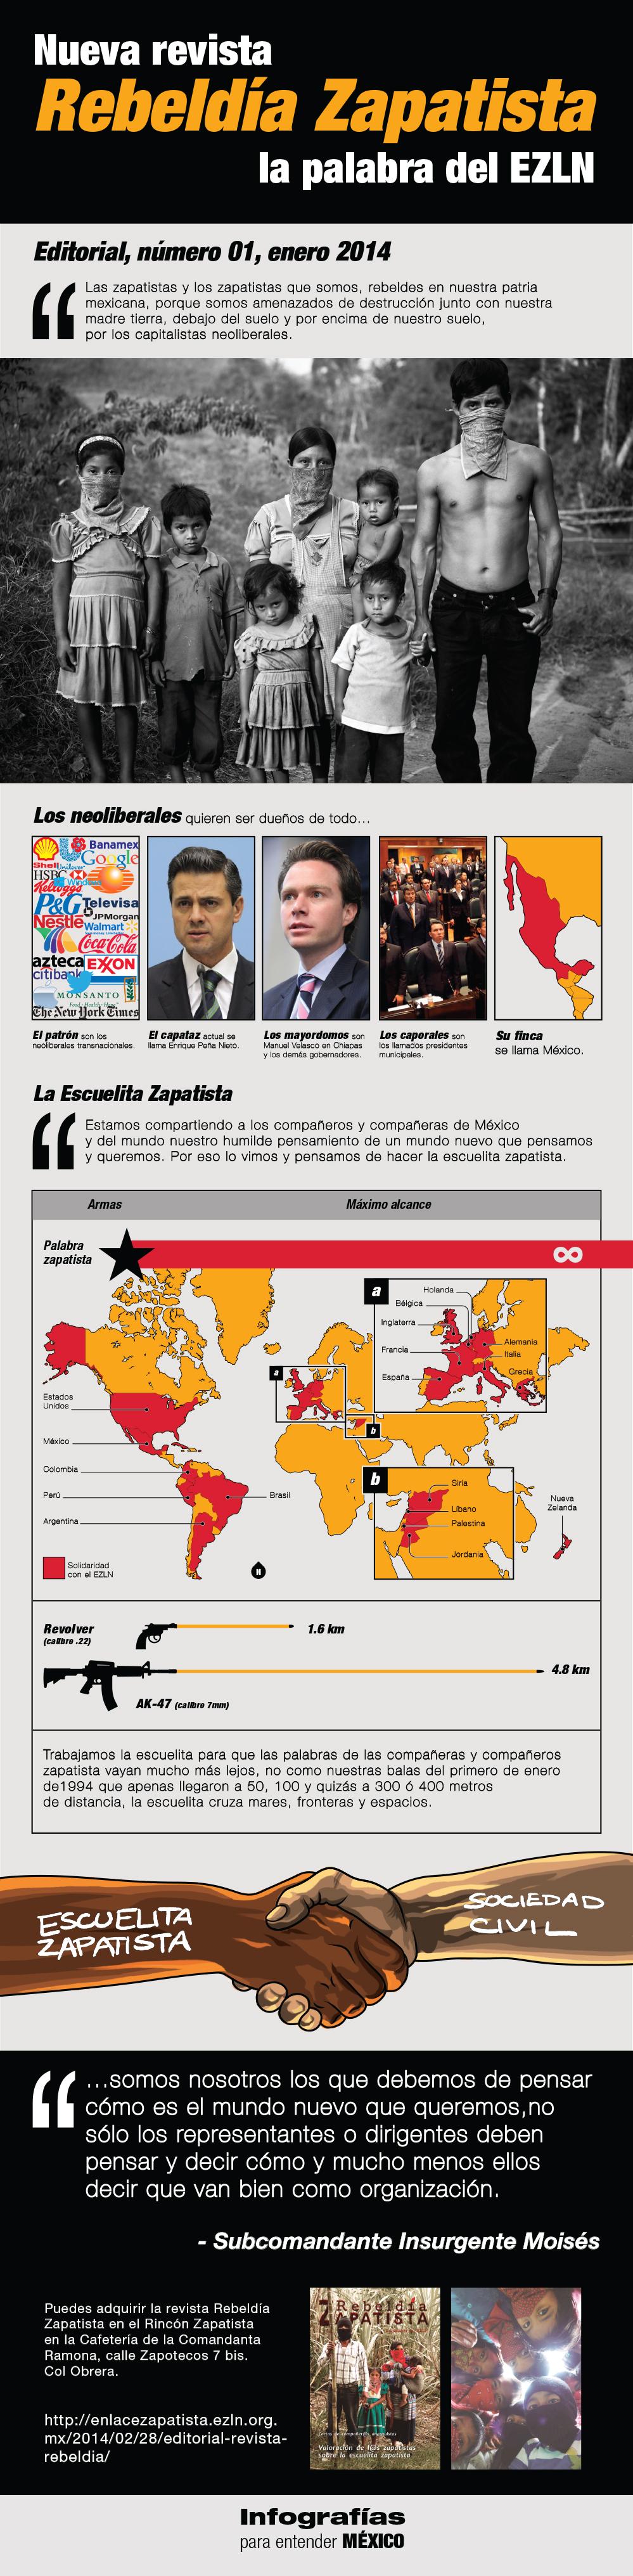 http://desinformemonos.org/wp-content/uploads/2014/03/REBELDIA-ZAPATISTA-1.jpg